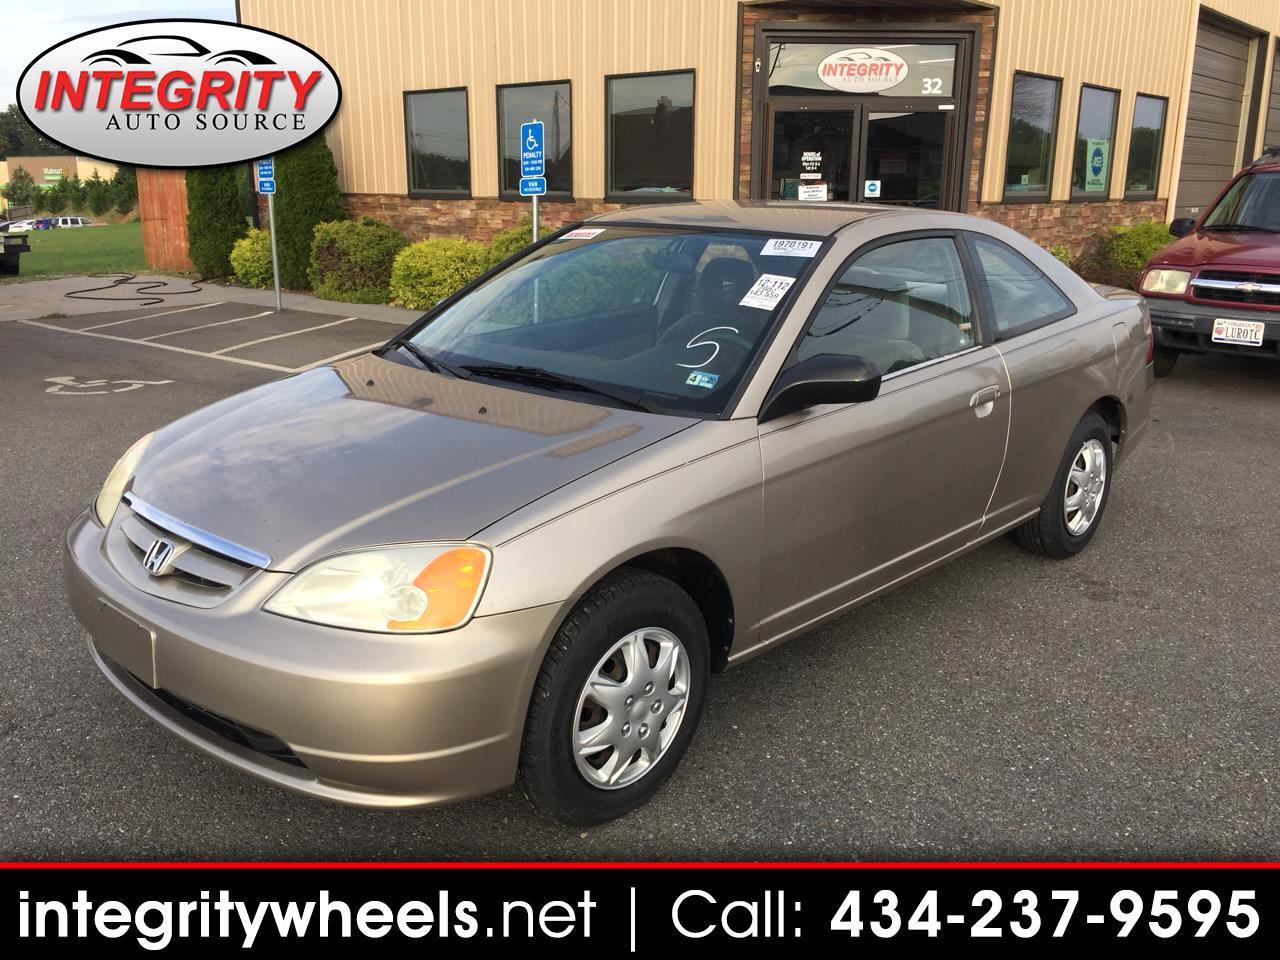 2002 Honda Civic LX coupe